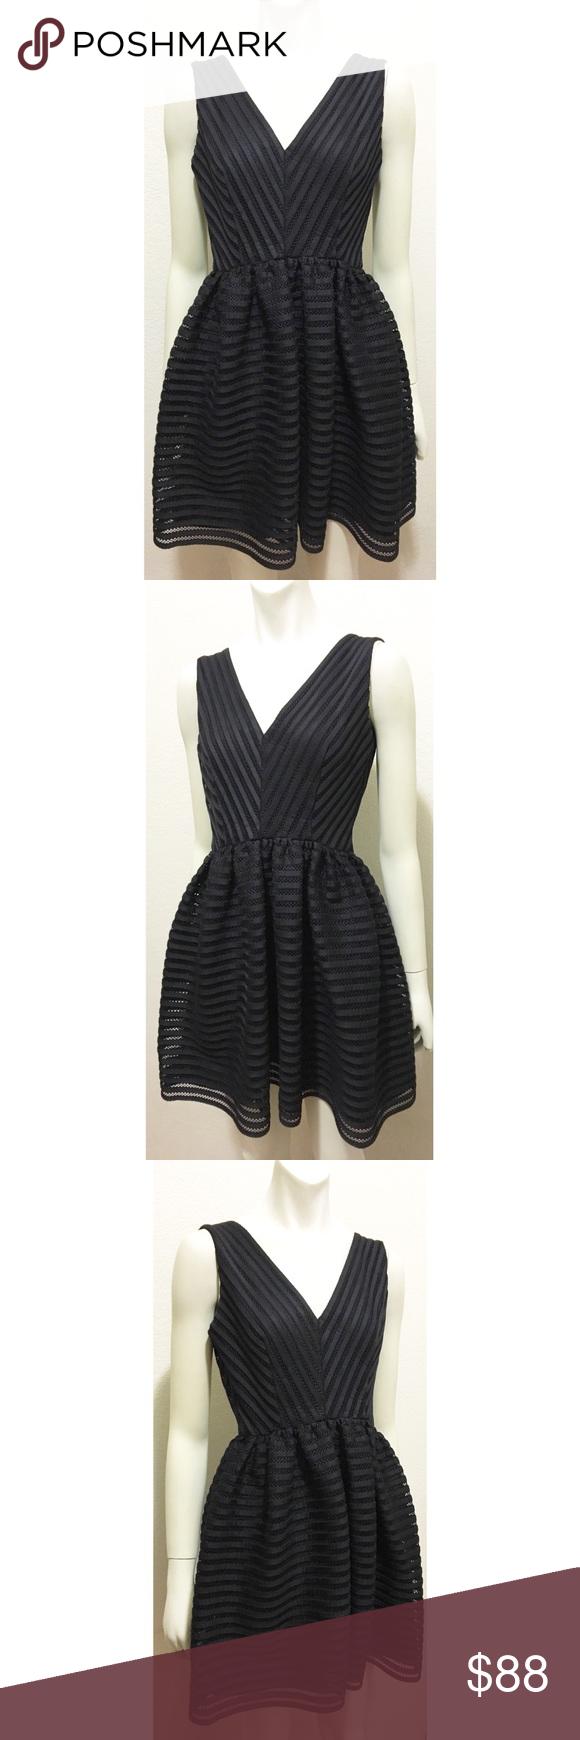 d8ac847bdf7 AQUA Small Black Mesh Neoprene Striped Dress